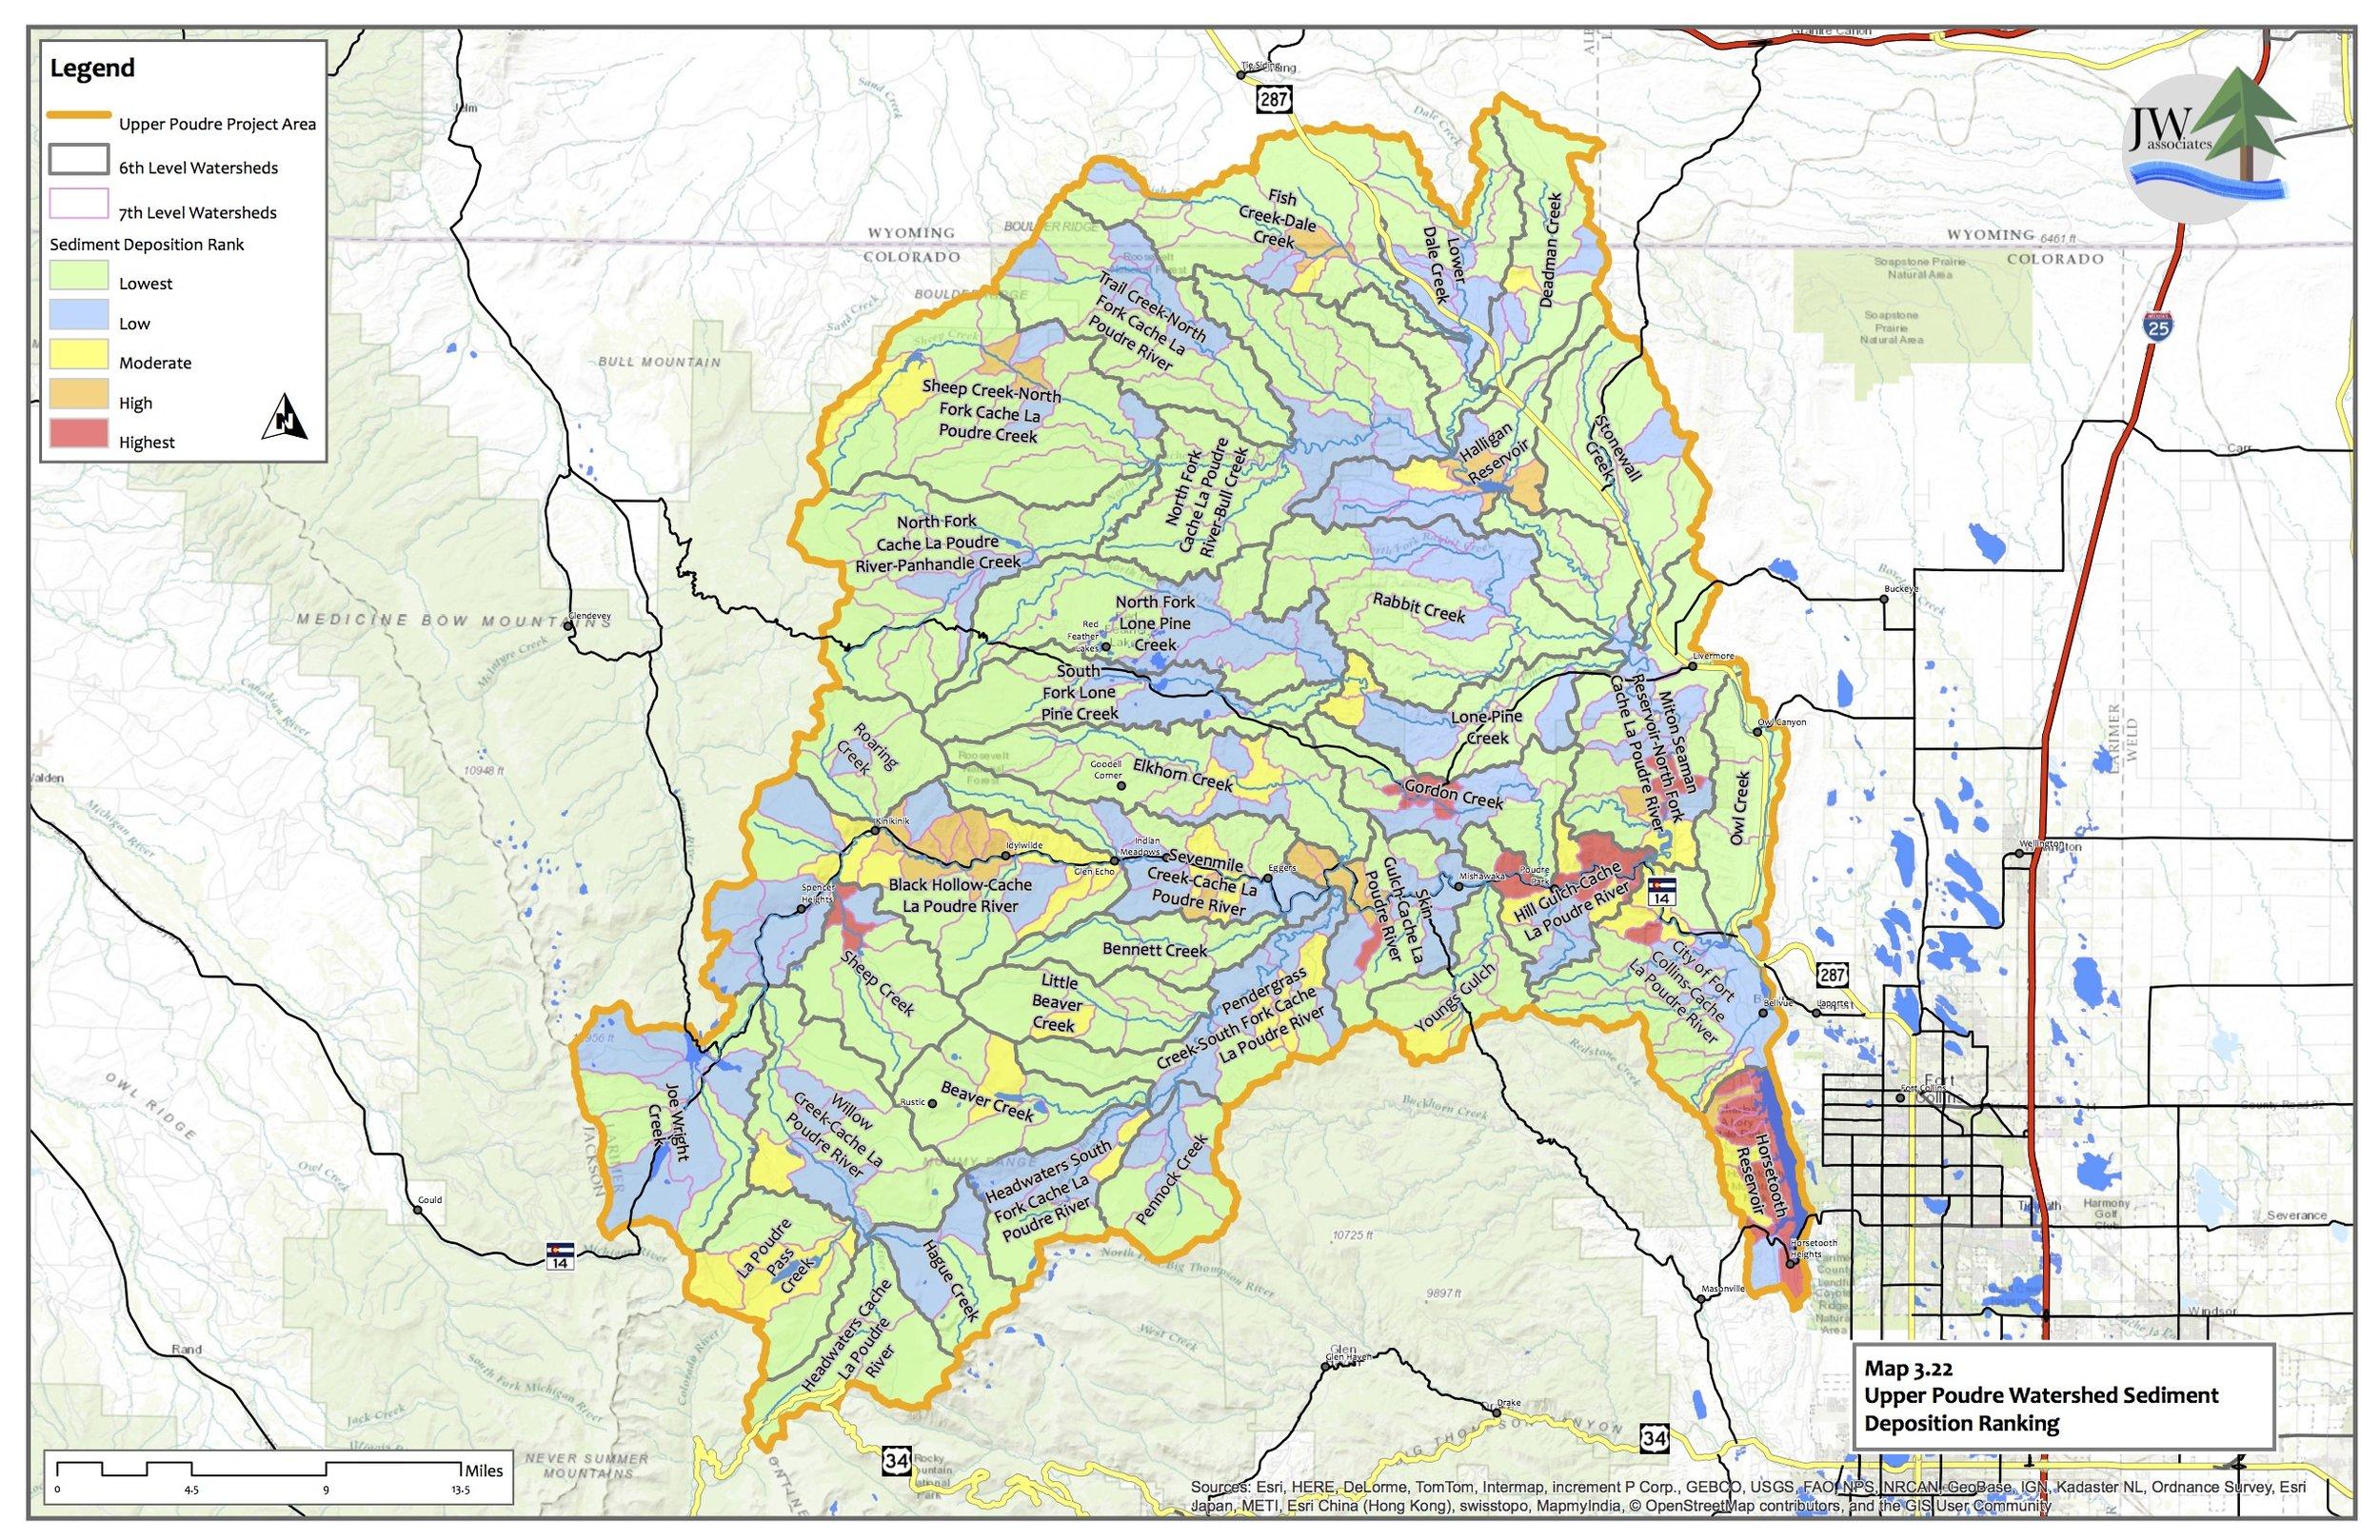 Map 3.22 UP_Deposition_Rank.jpg